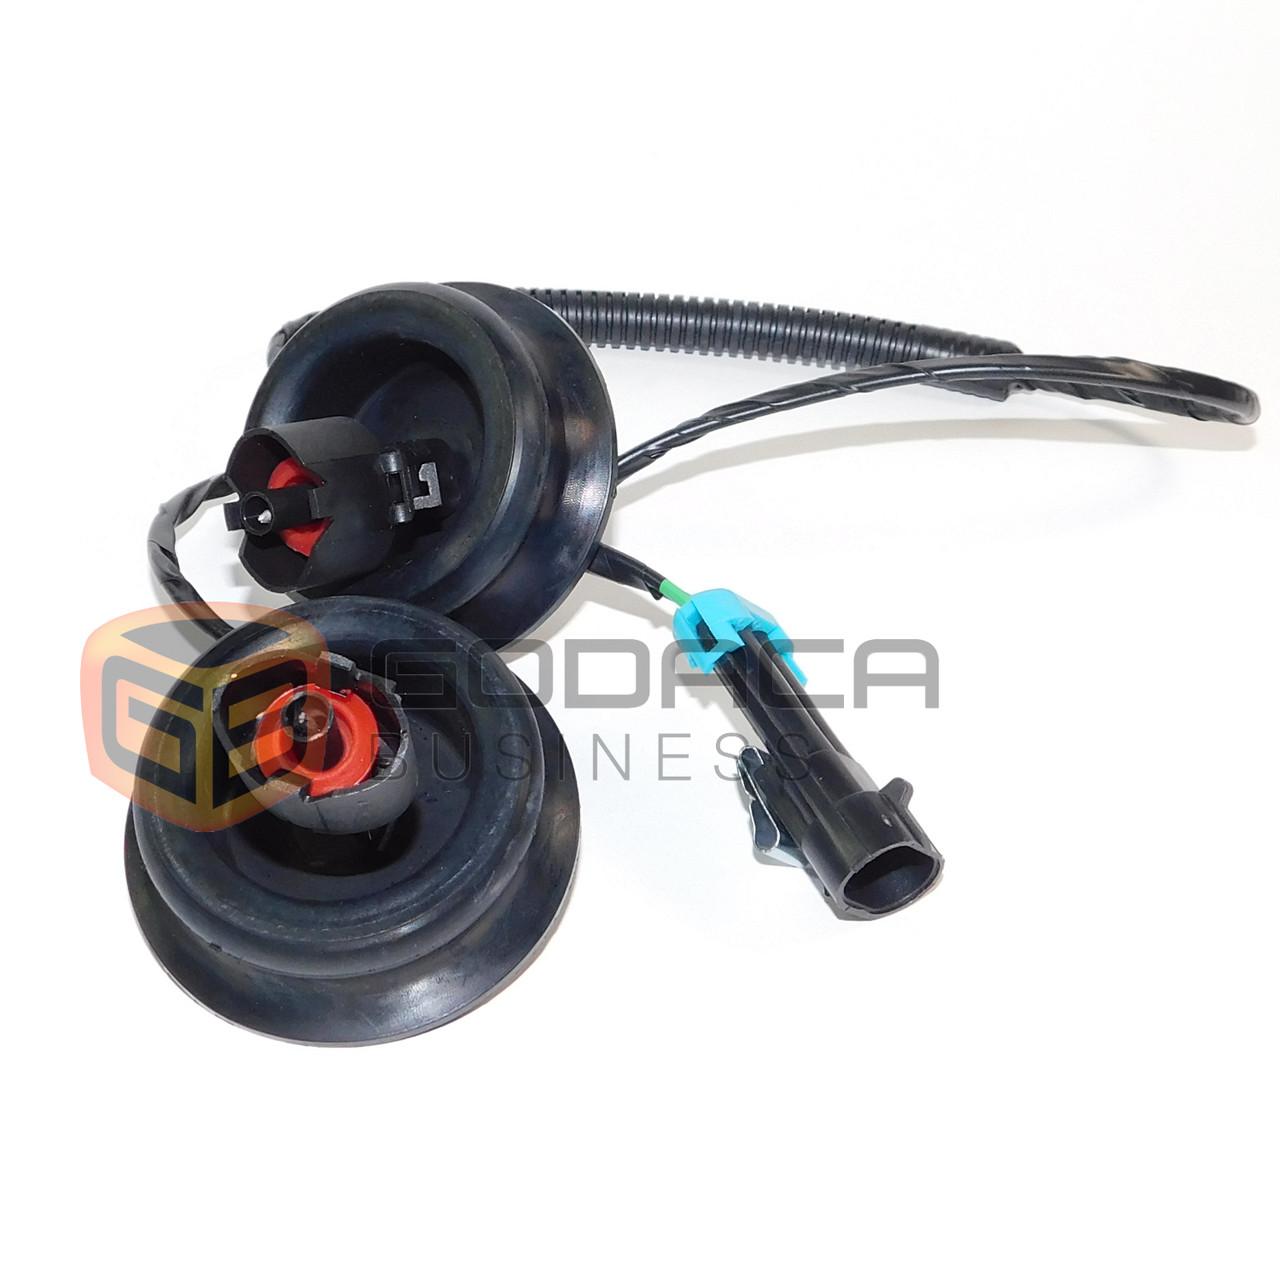 1x harness for engine knock sensor dual connectors grommets cadillac chevy gmc godaca llc  [ 1280 x 1280 Pixel ]